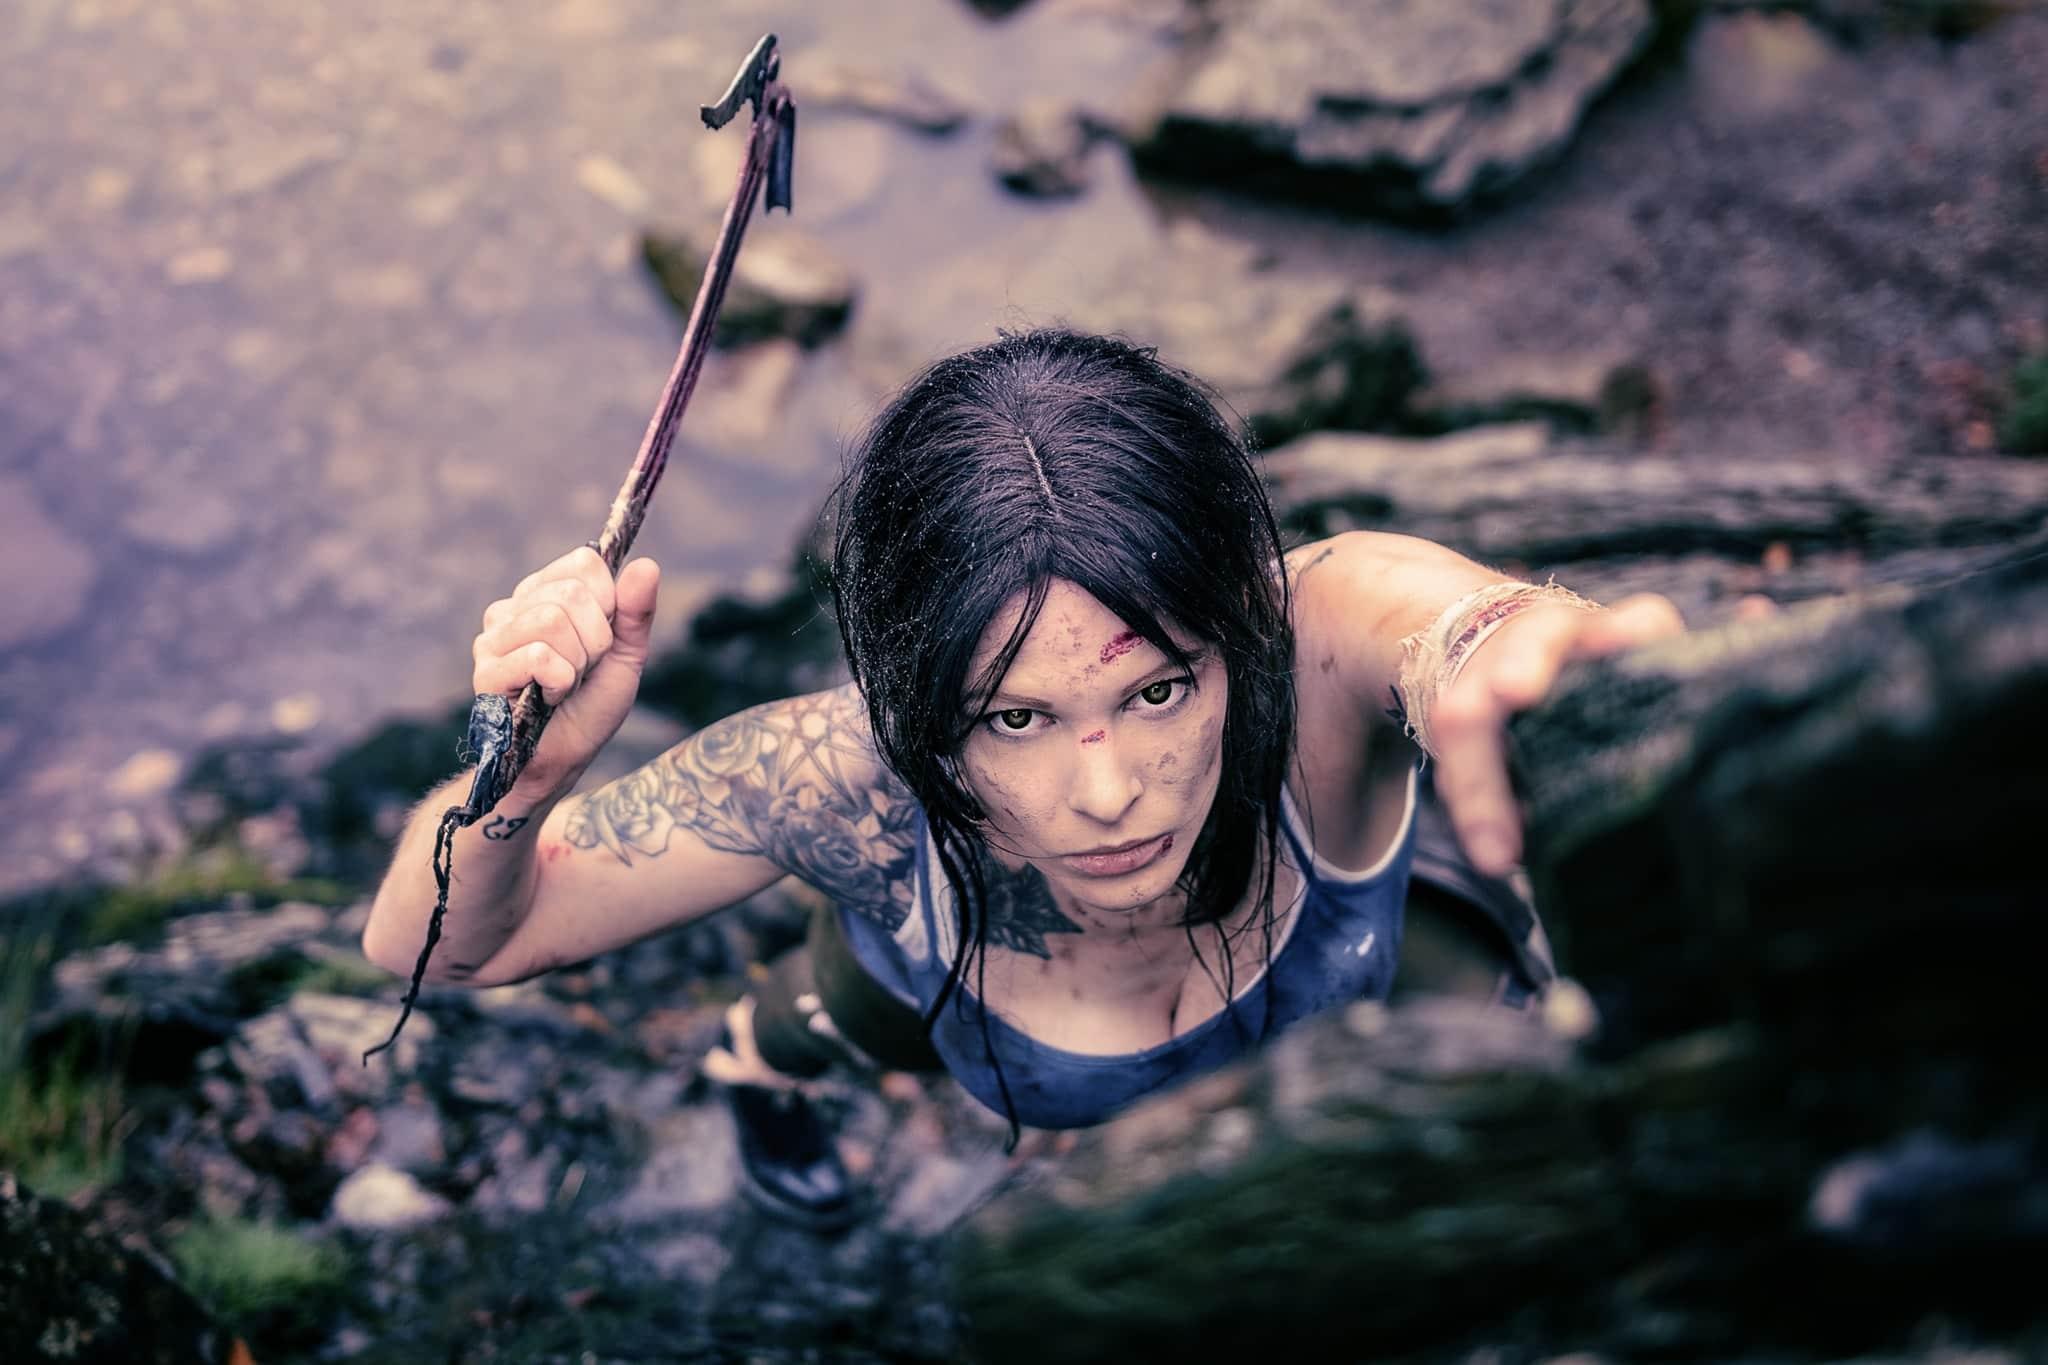 Lara Croft - Monono Cosplay - Tomb Raider 2013